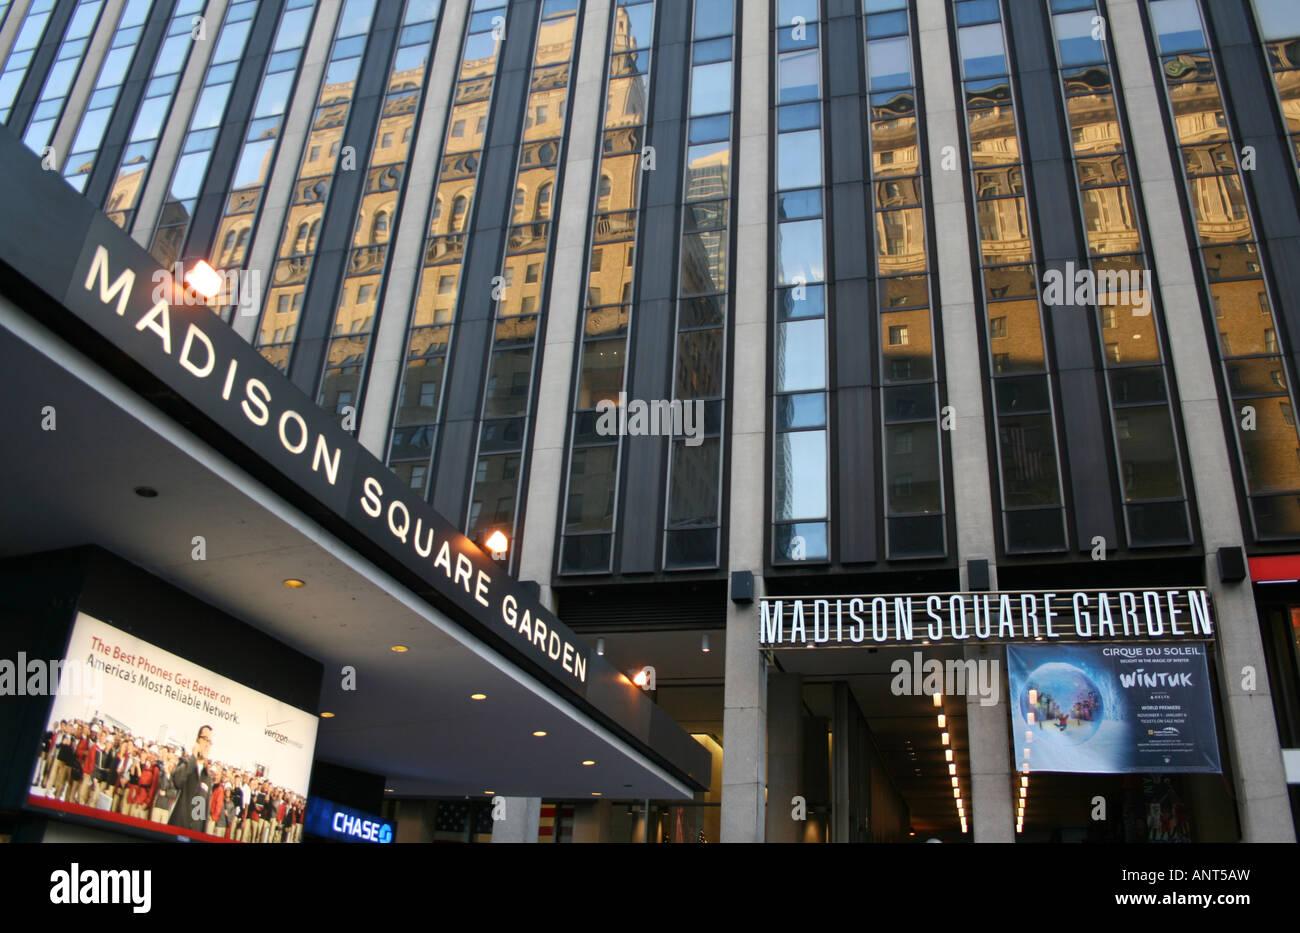 Entrance To Madison Square Garden Sports Arena Manhattan New York City  November 2007